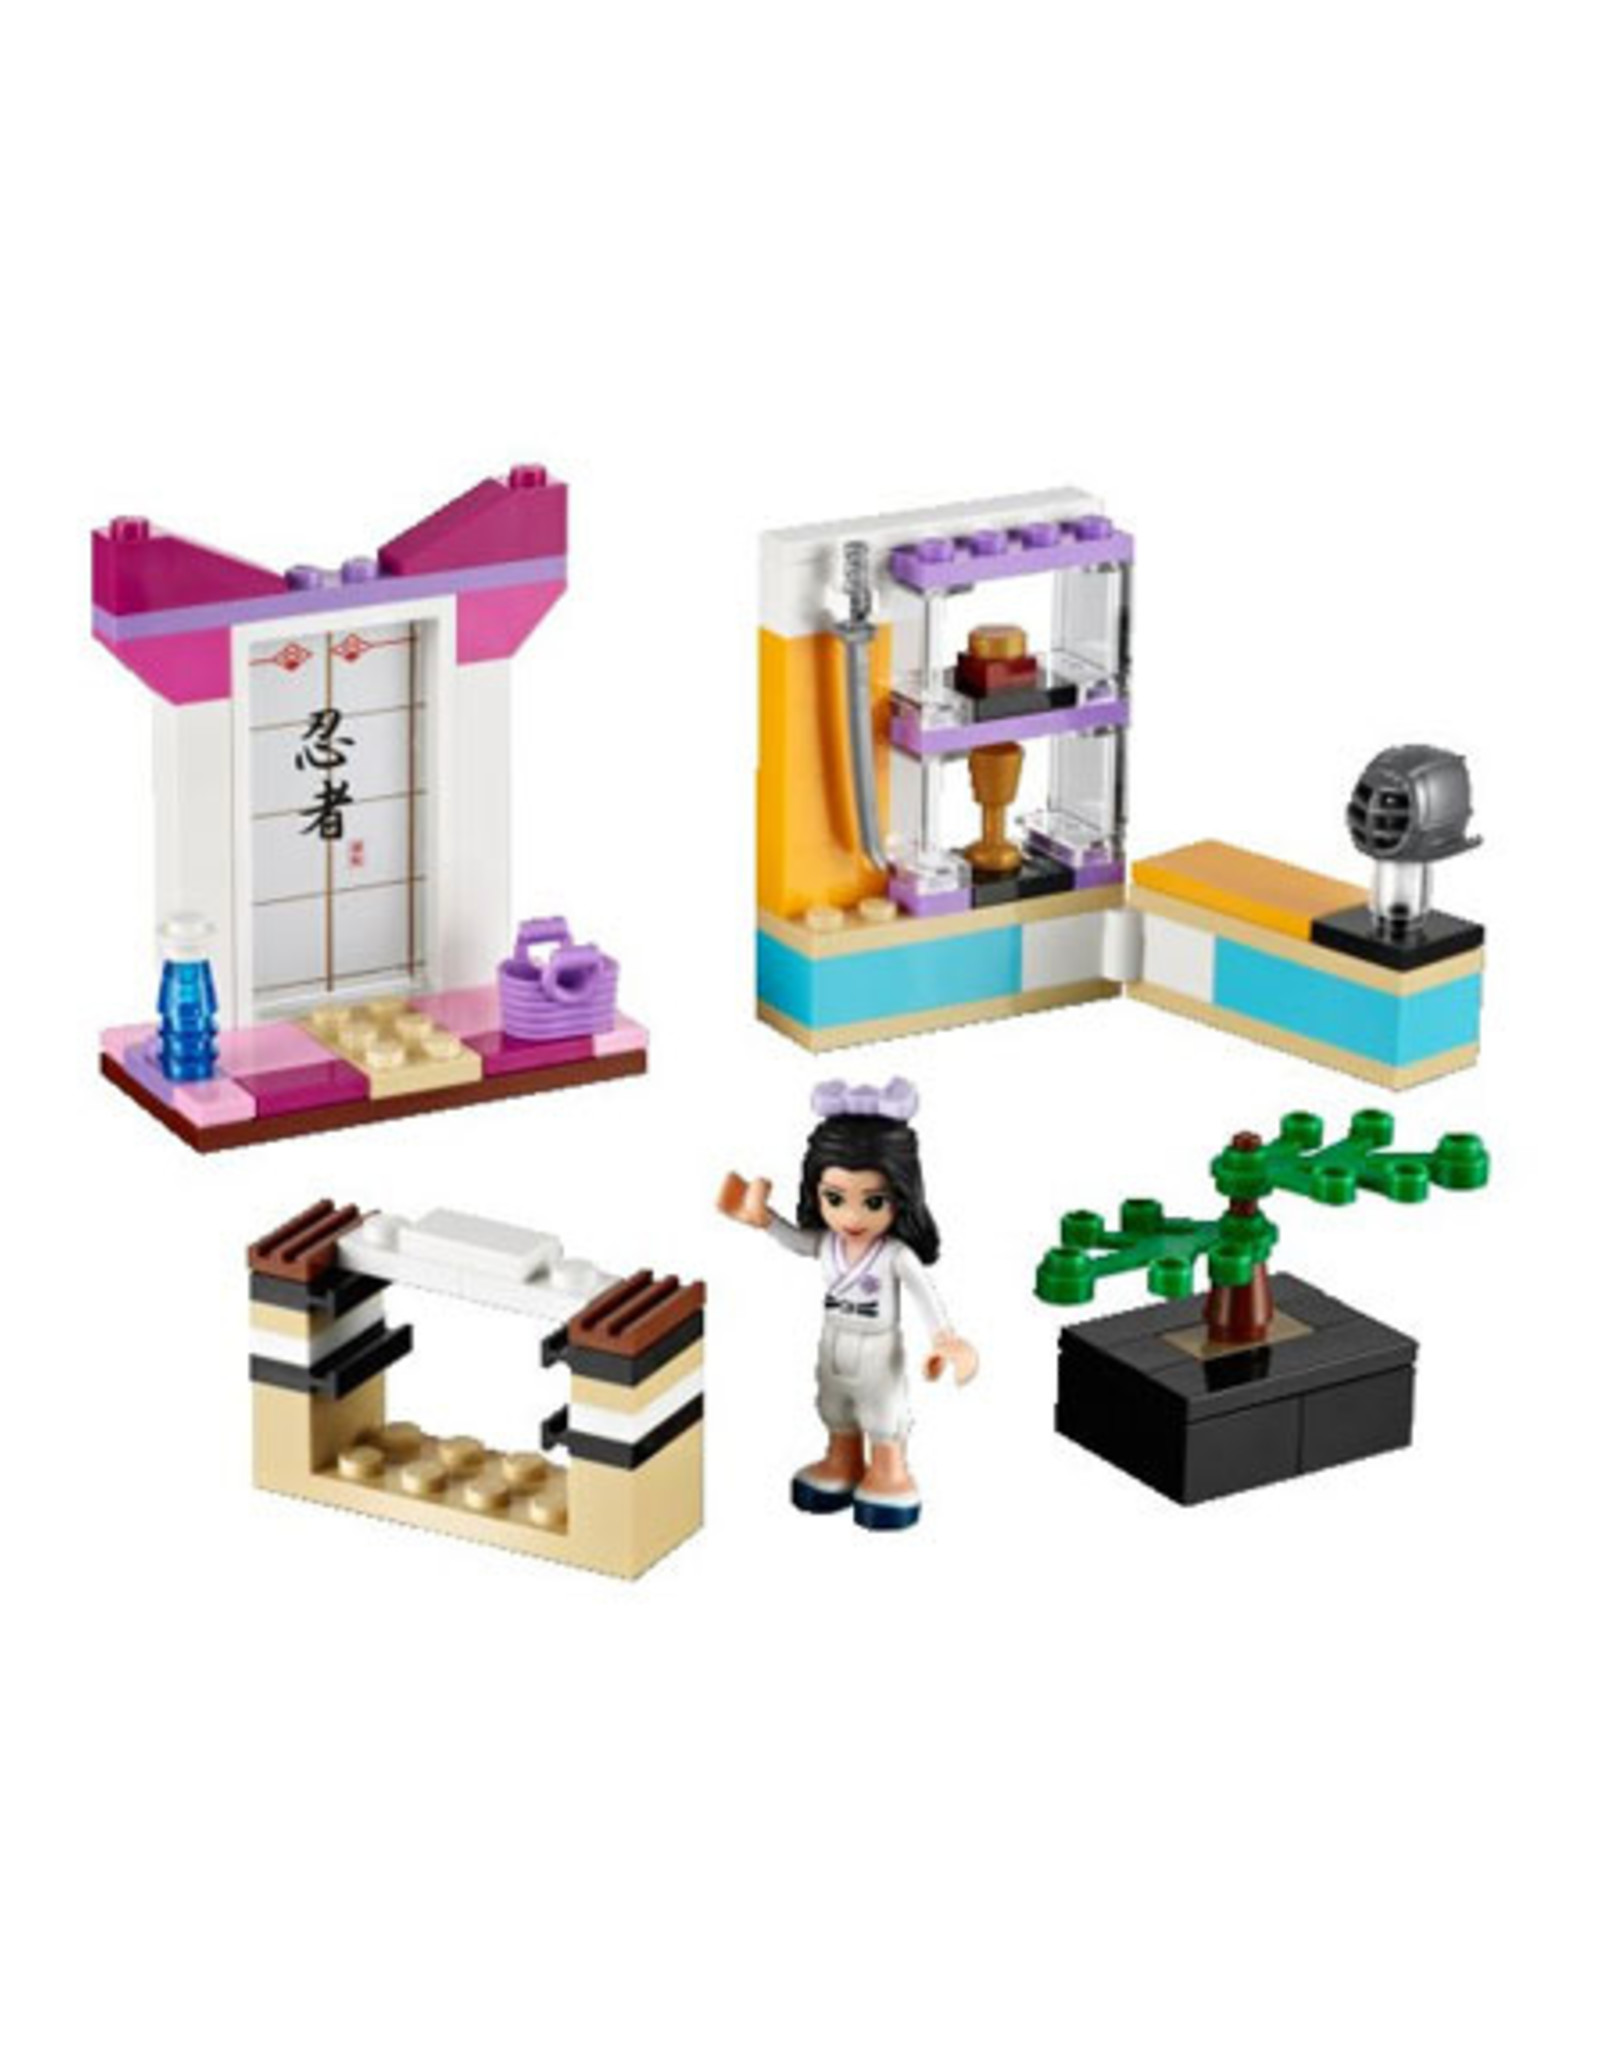 LEGO LEGO 41002 Emma's Karate Class FRIENDS